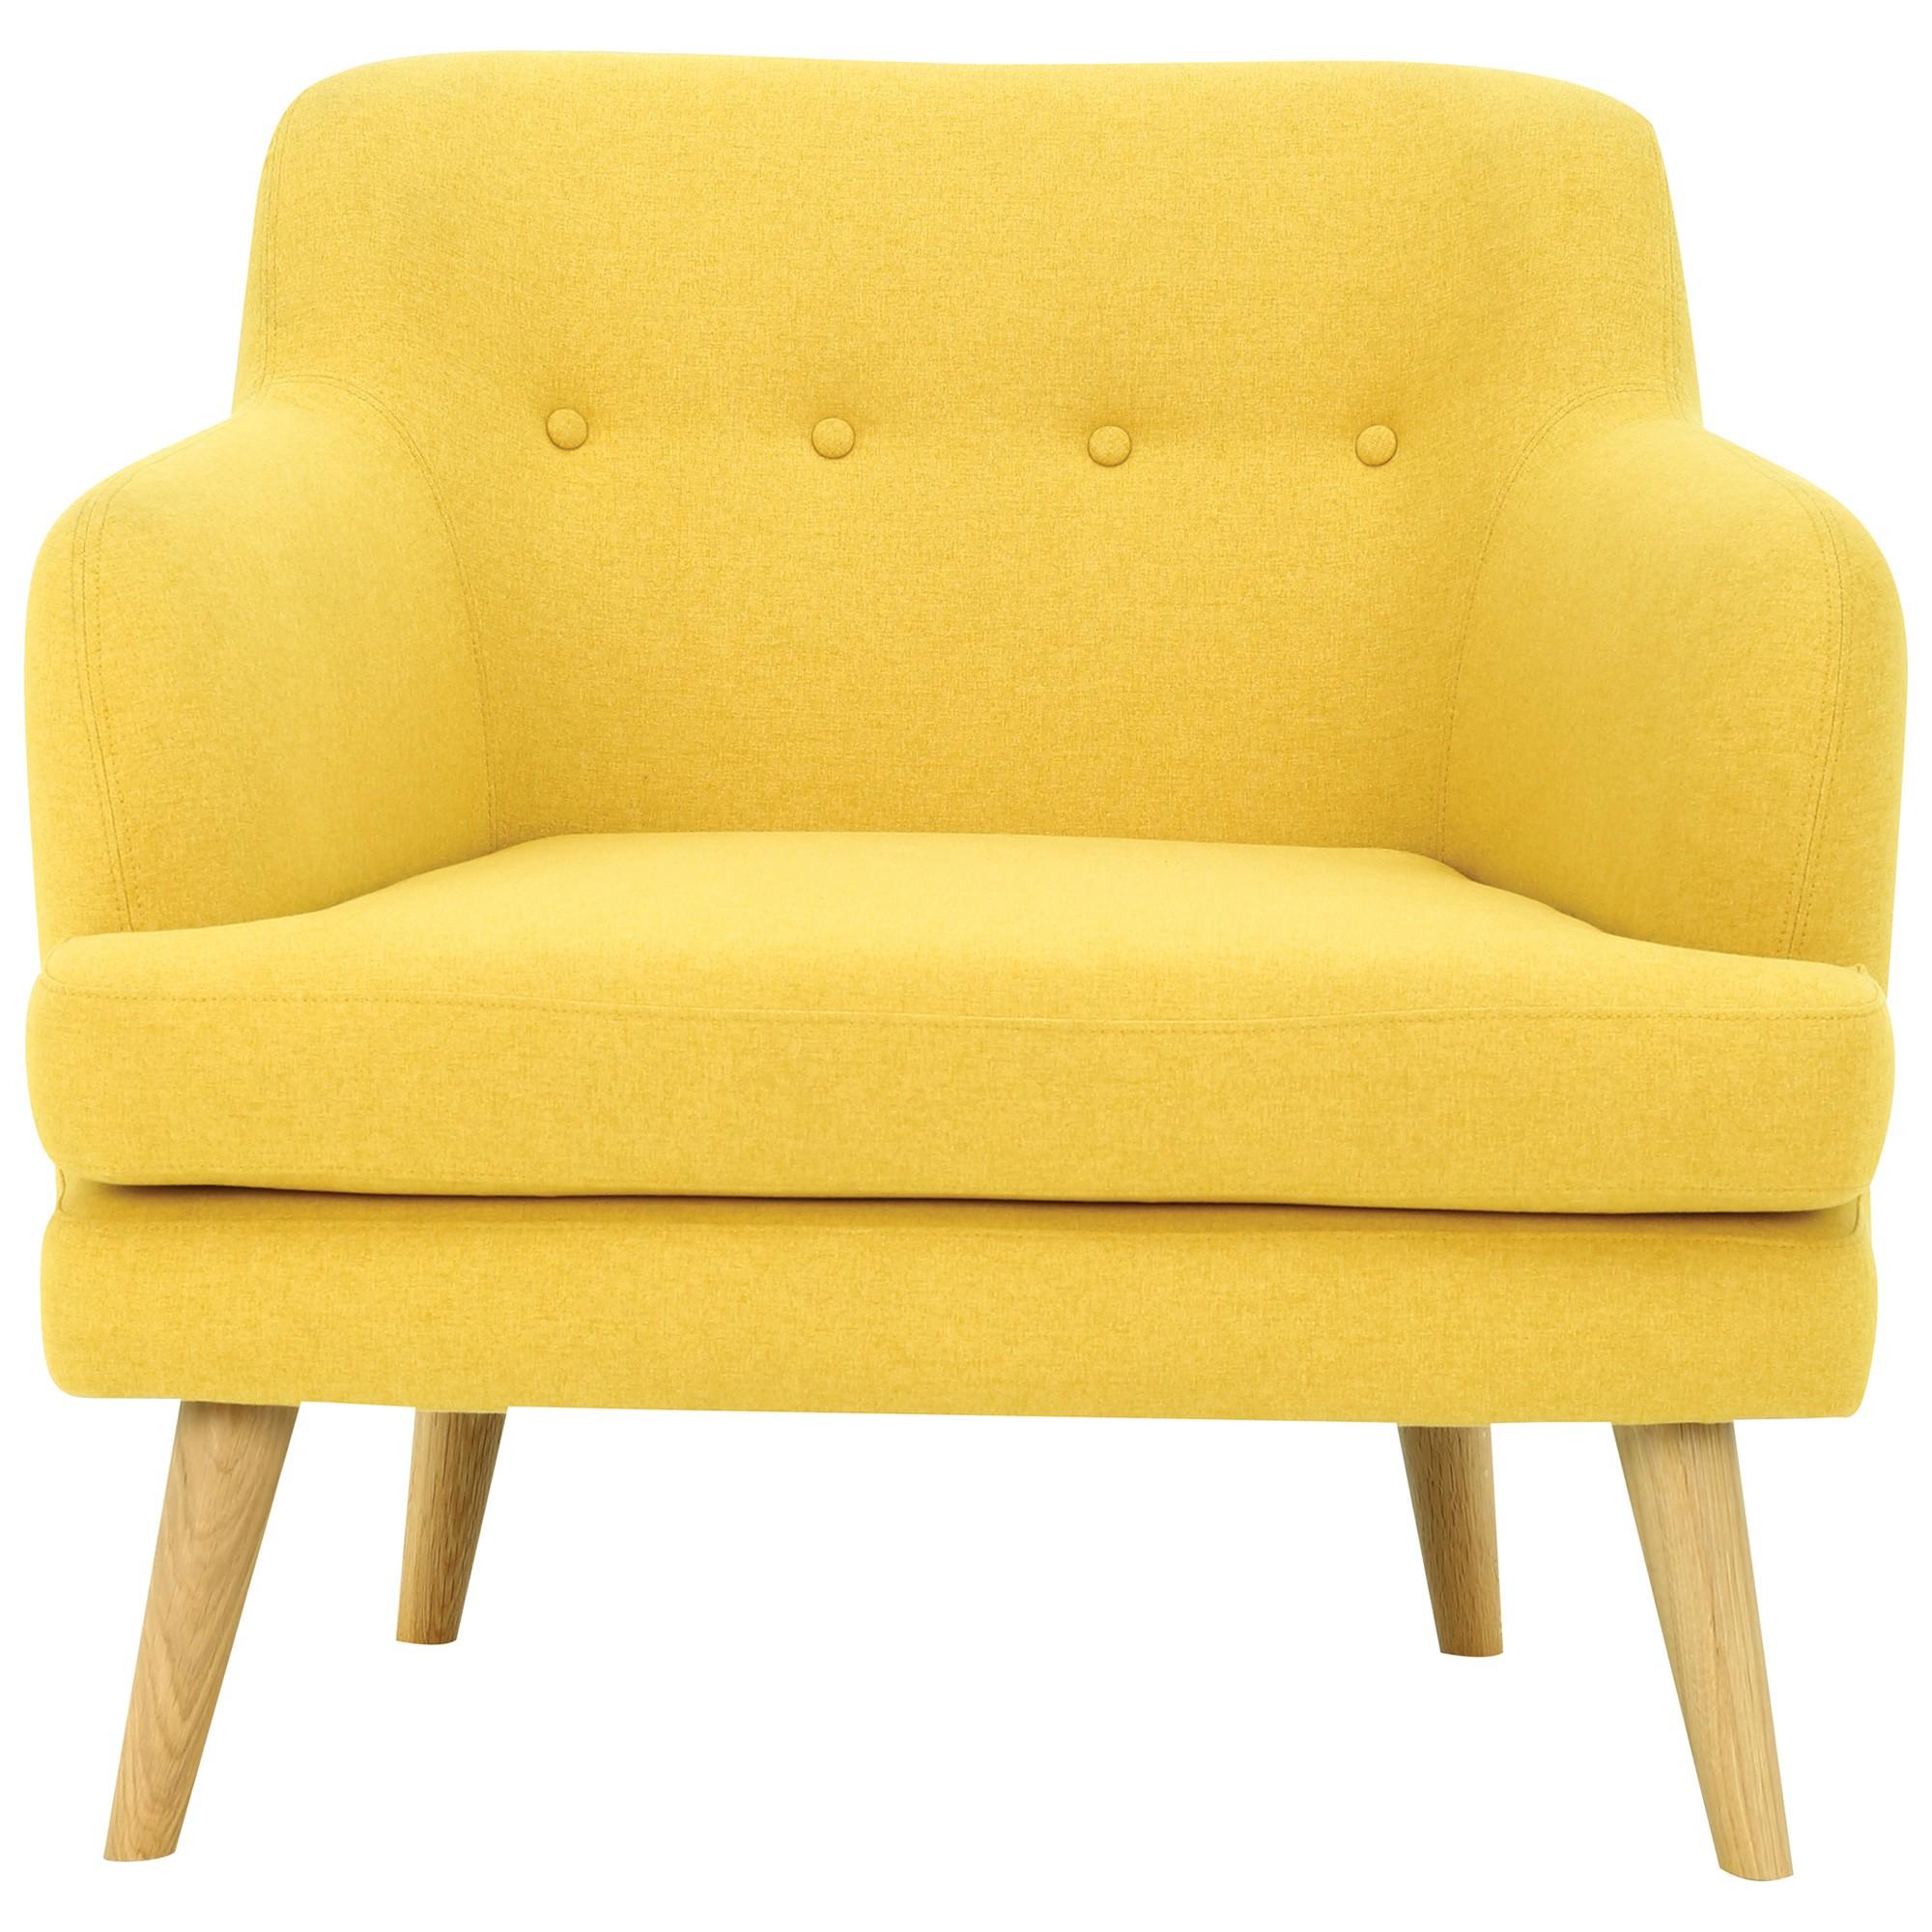 Exelero Commercial Grade Fabric Armchair, Yellow